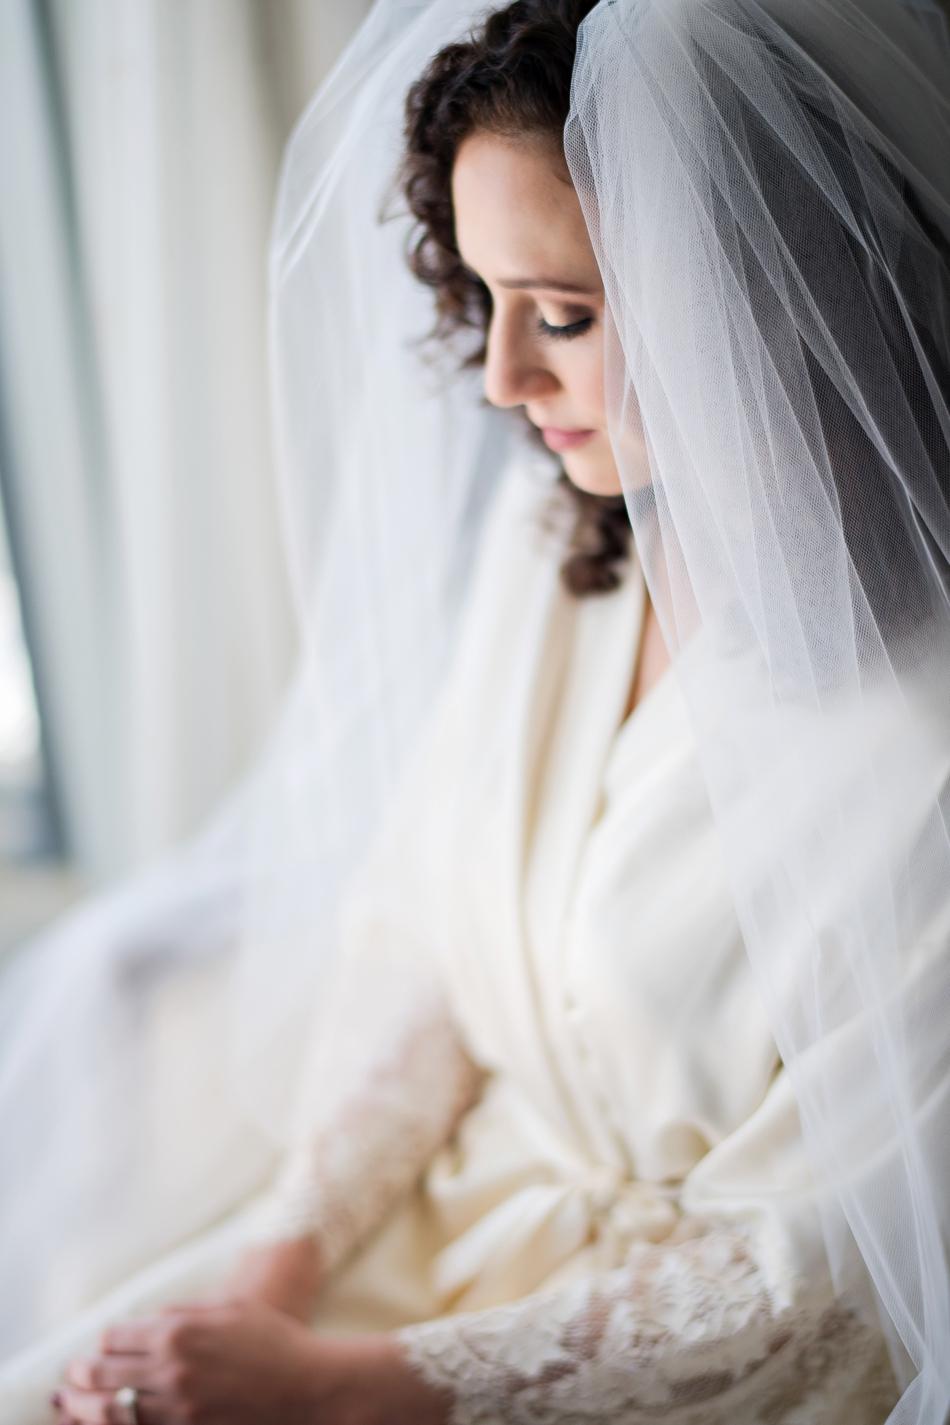 wedding day robe getting ready photo